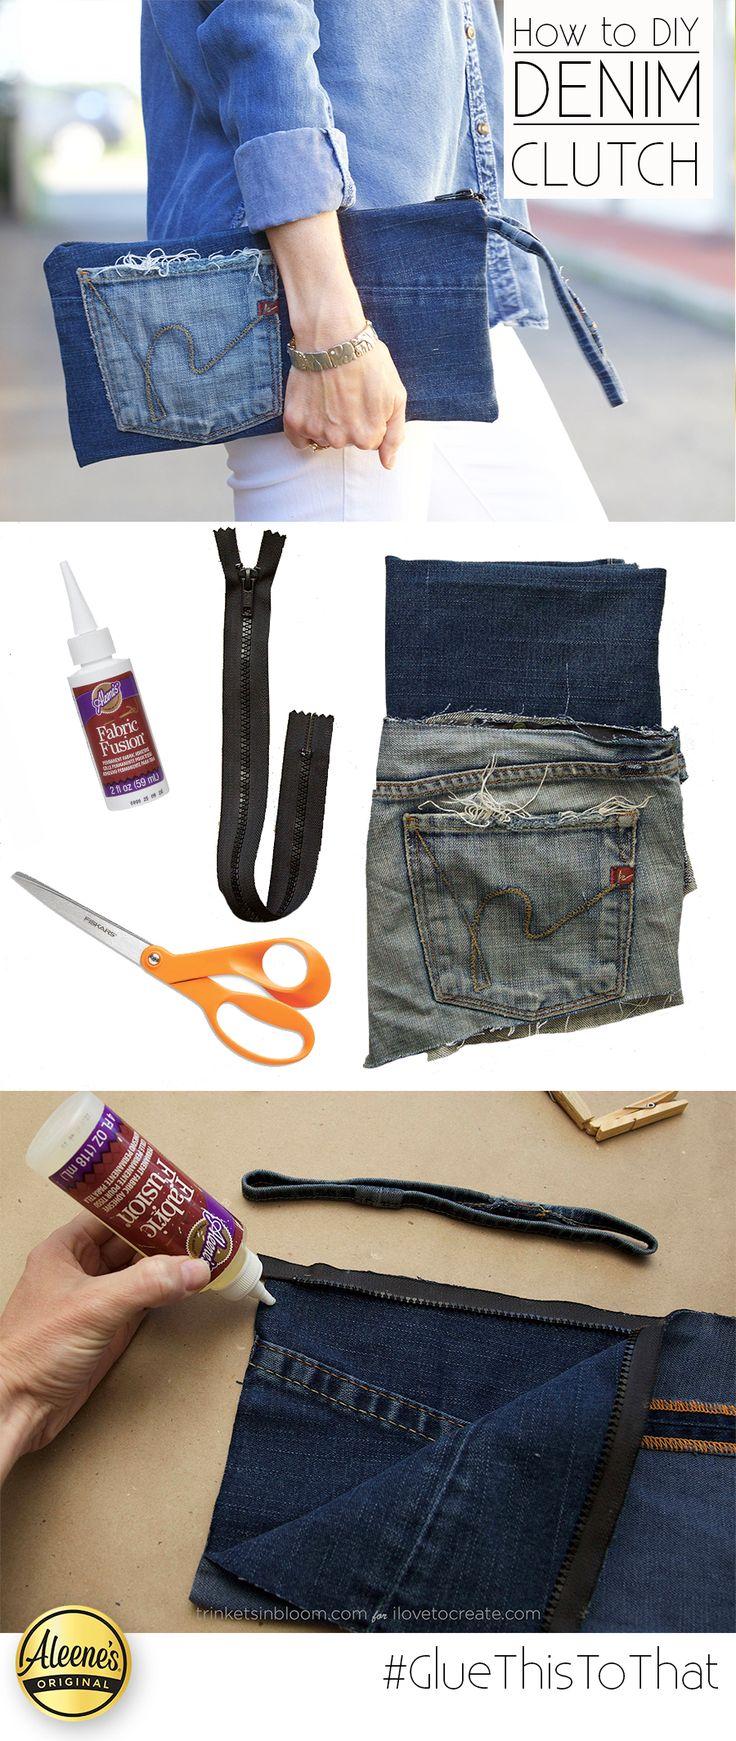 best 25+ denim clutches ideas on pinterest | denim clutch bags